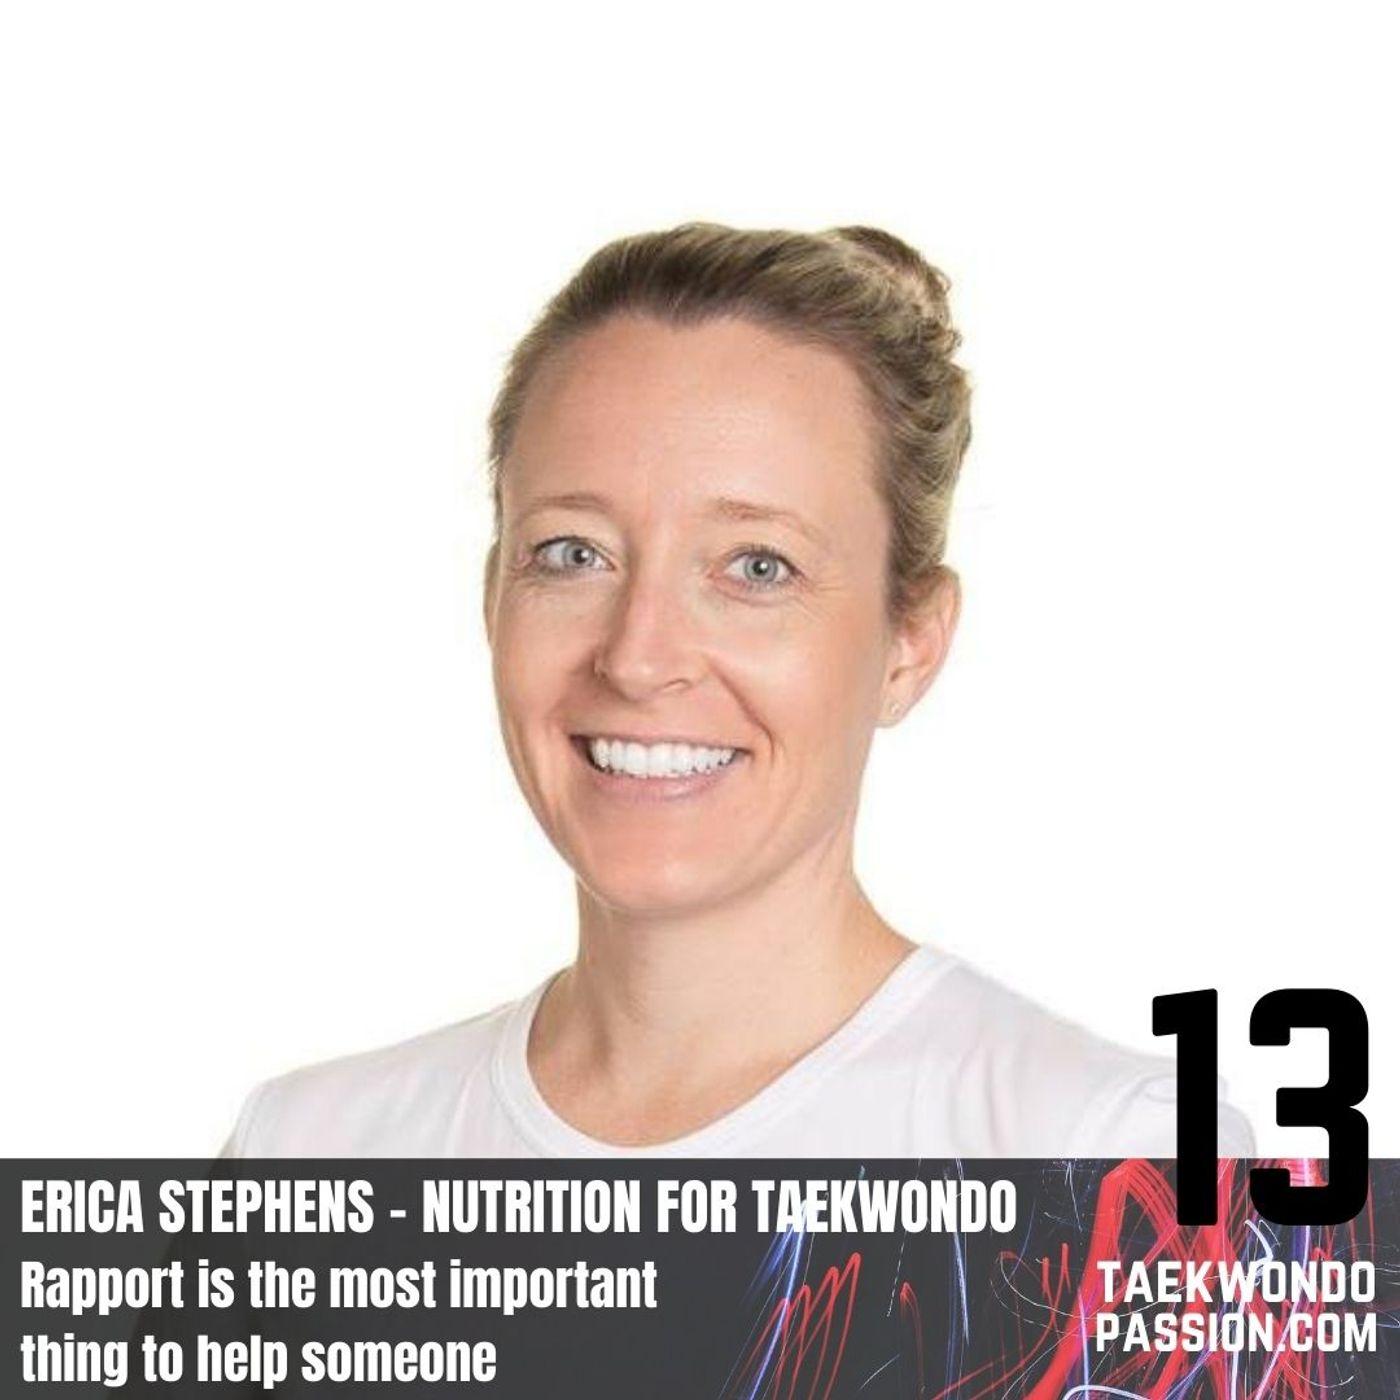 Erica Stephens - Nutrition for taekwondo